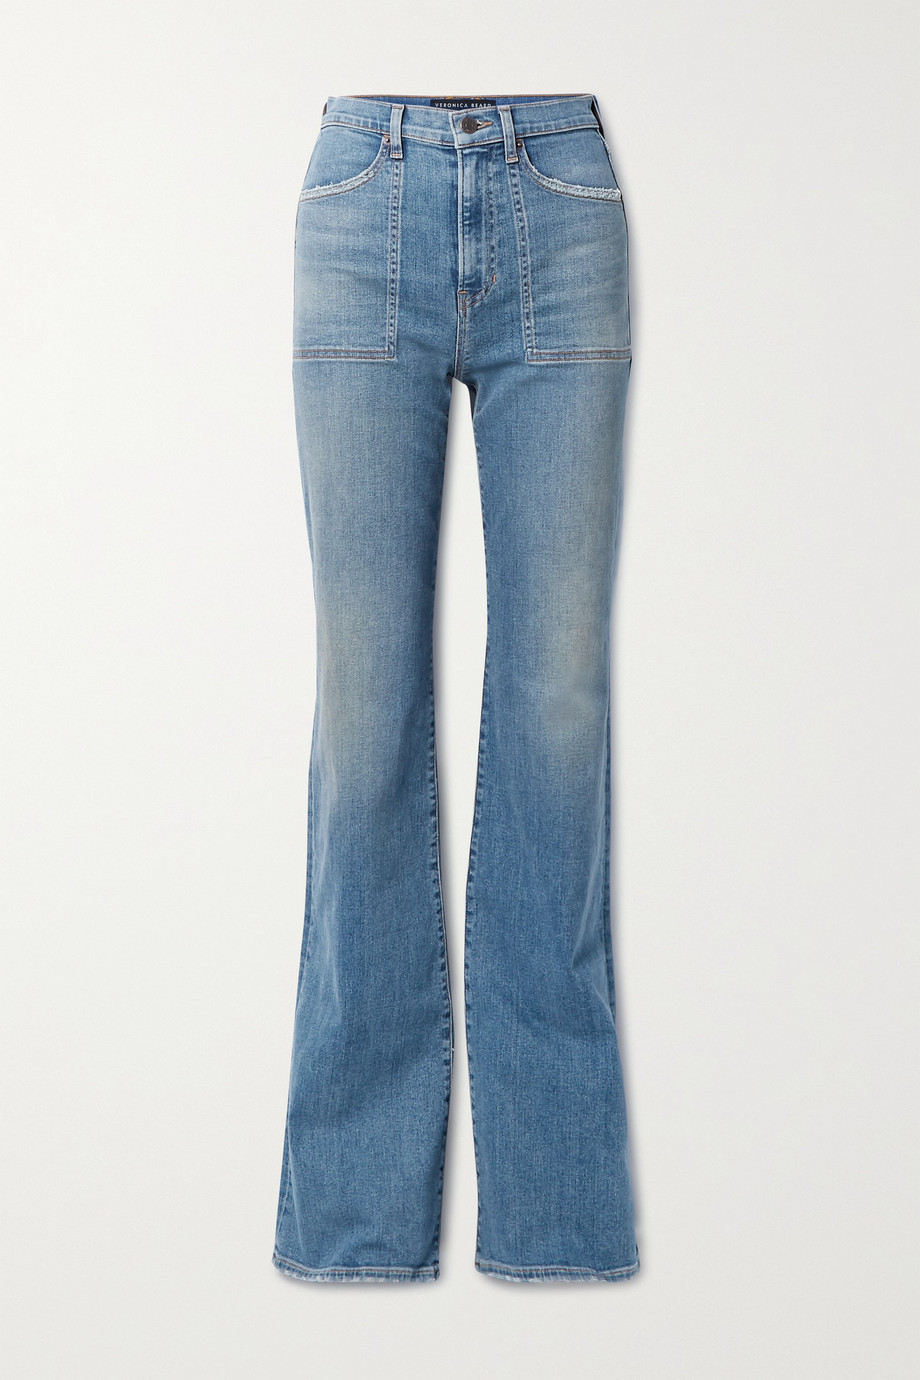 Veronica Beard Crosbie high-rise flared jeans